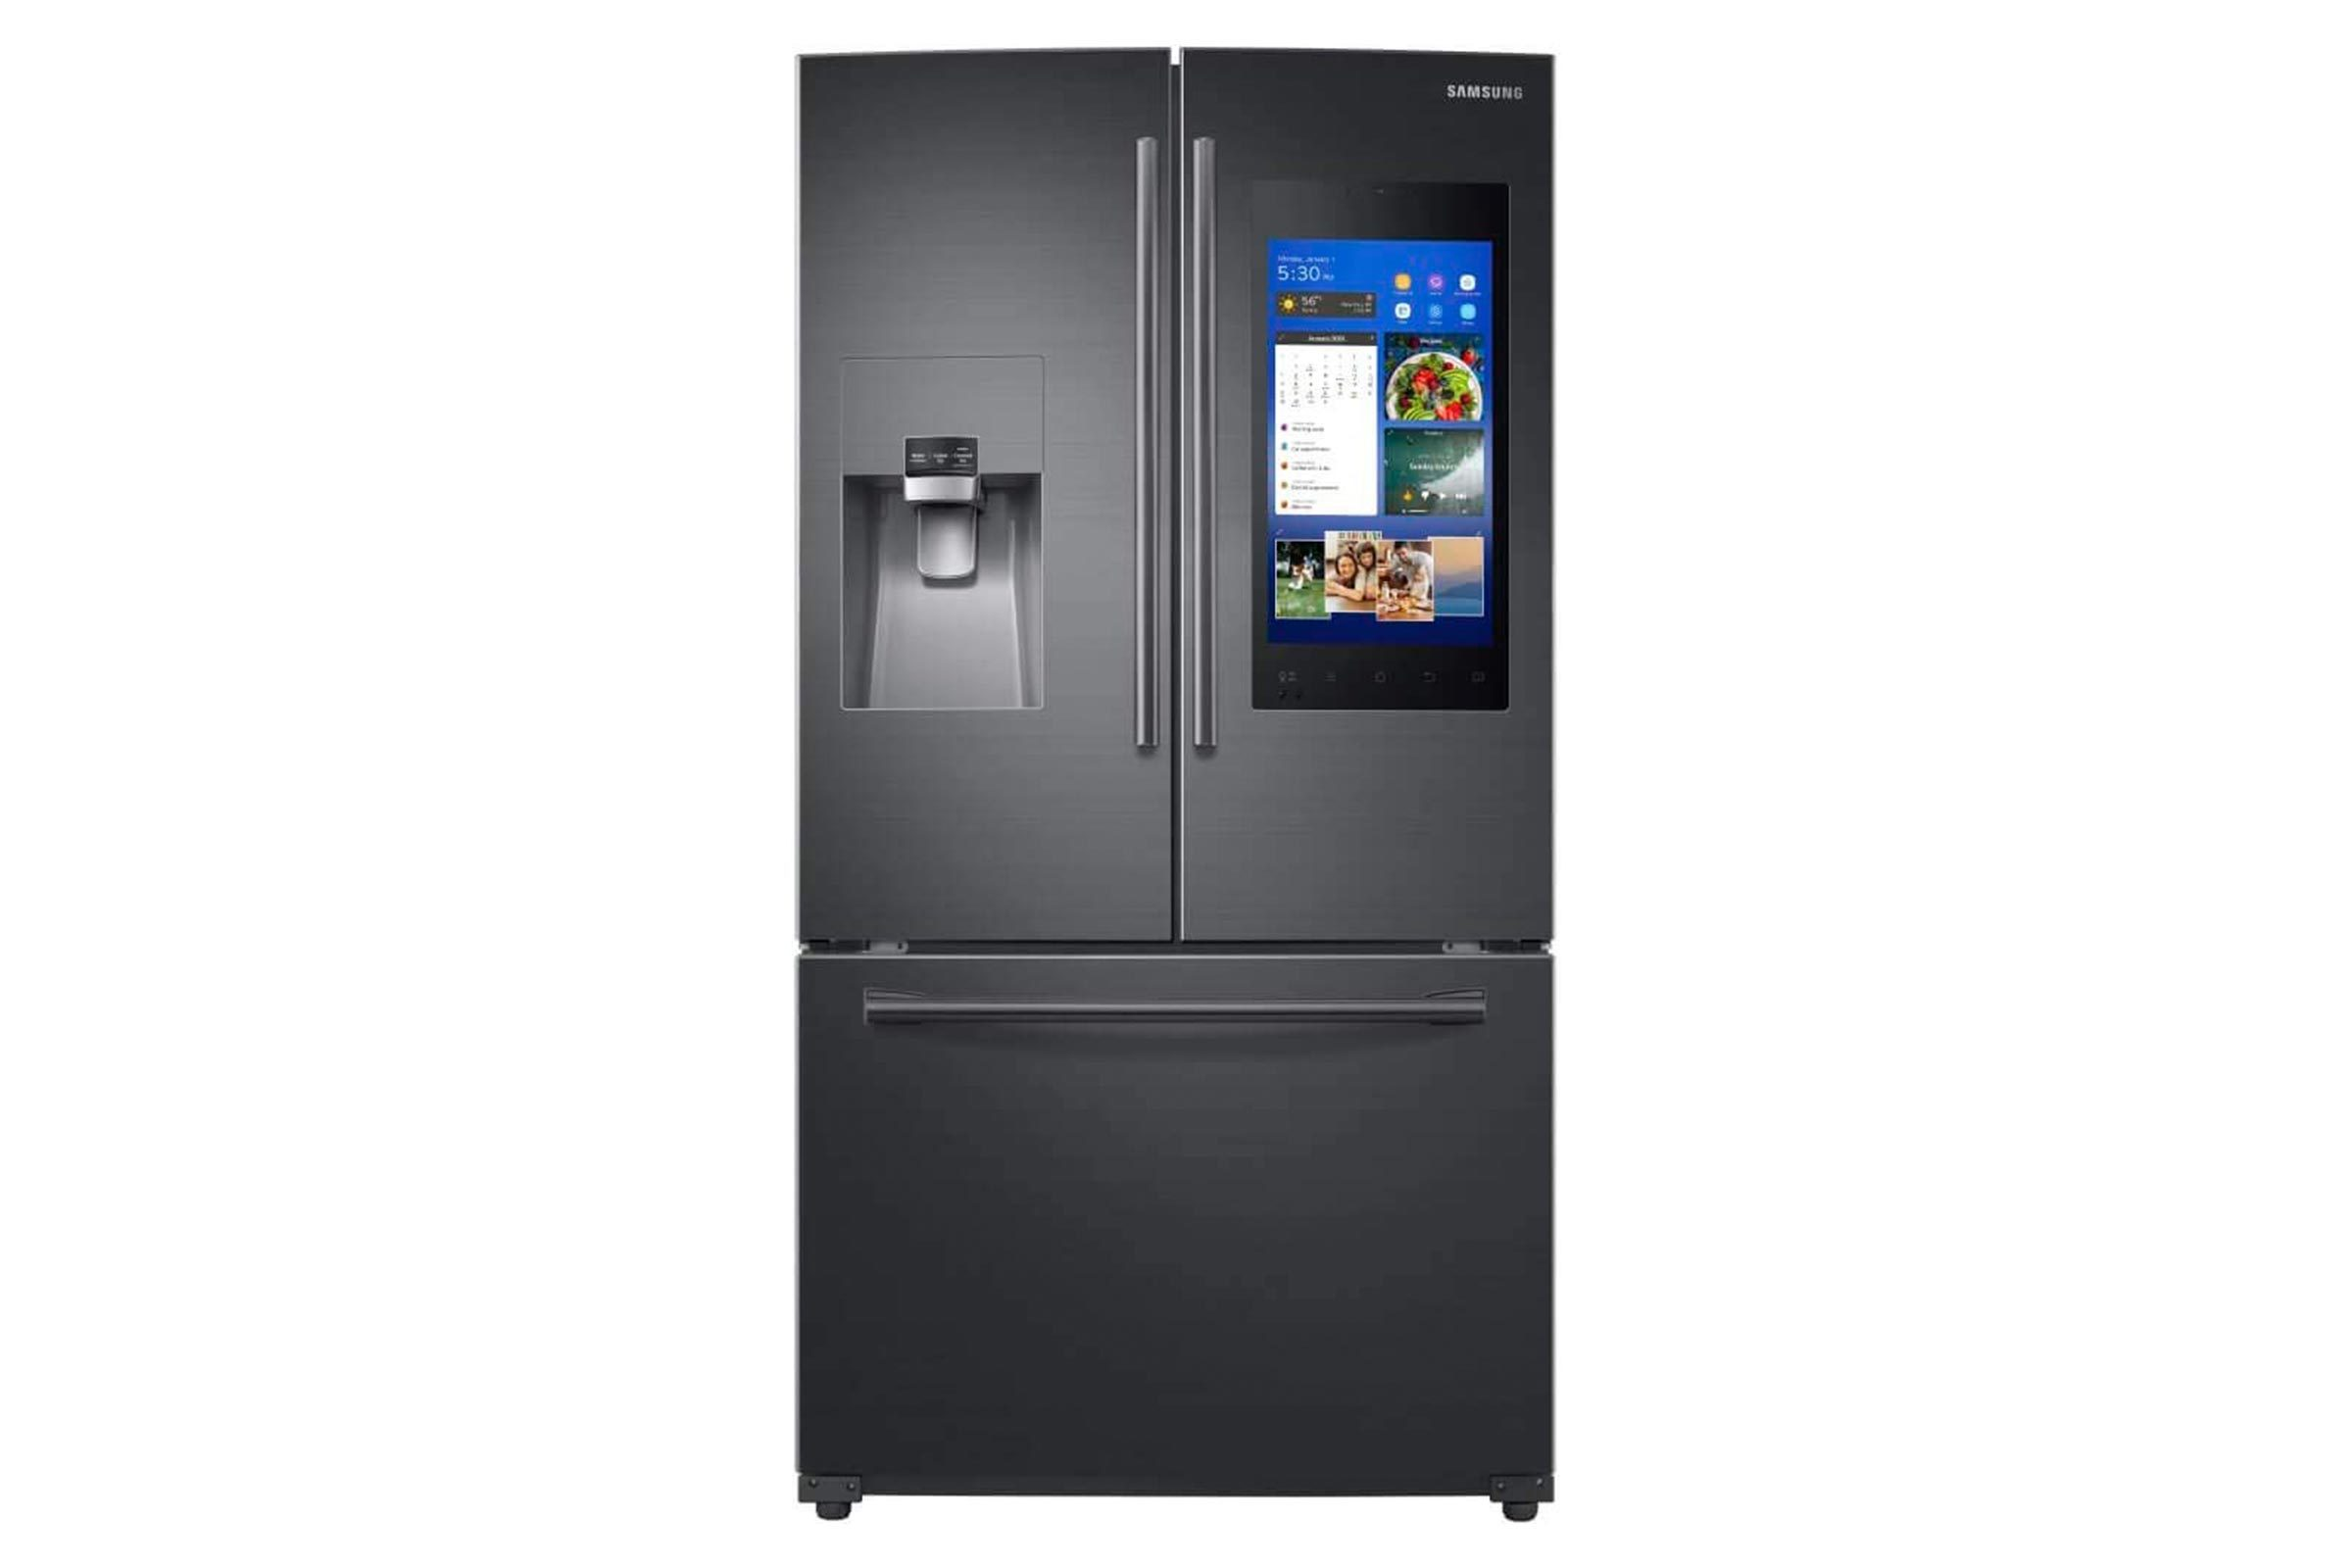 Samsung Black Stainless Refridgerator